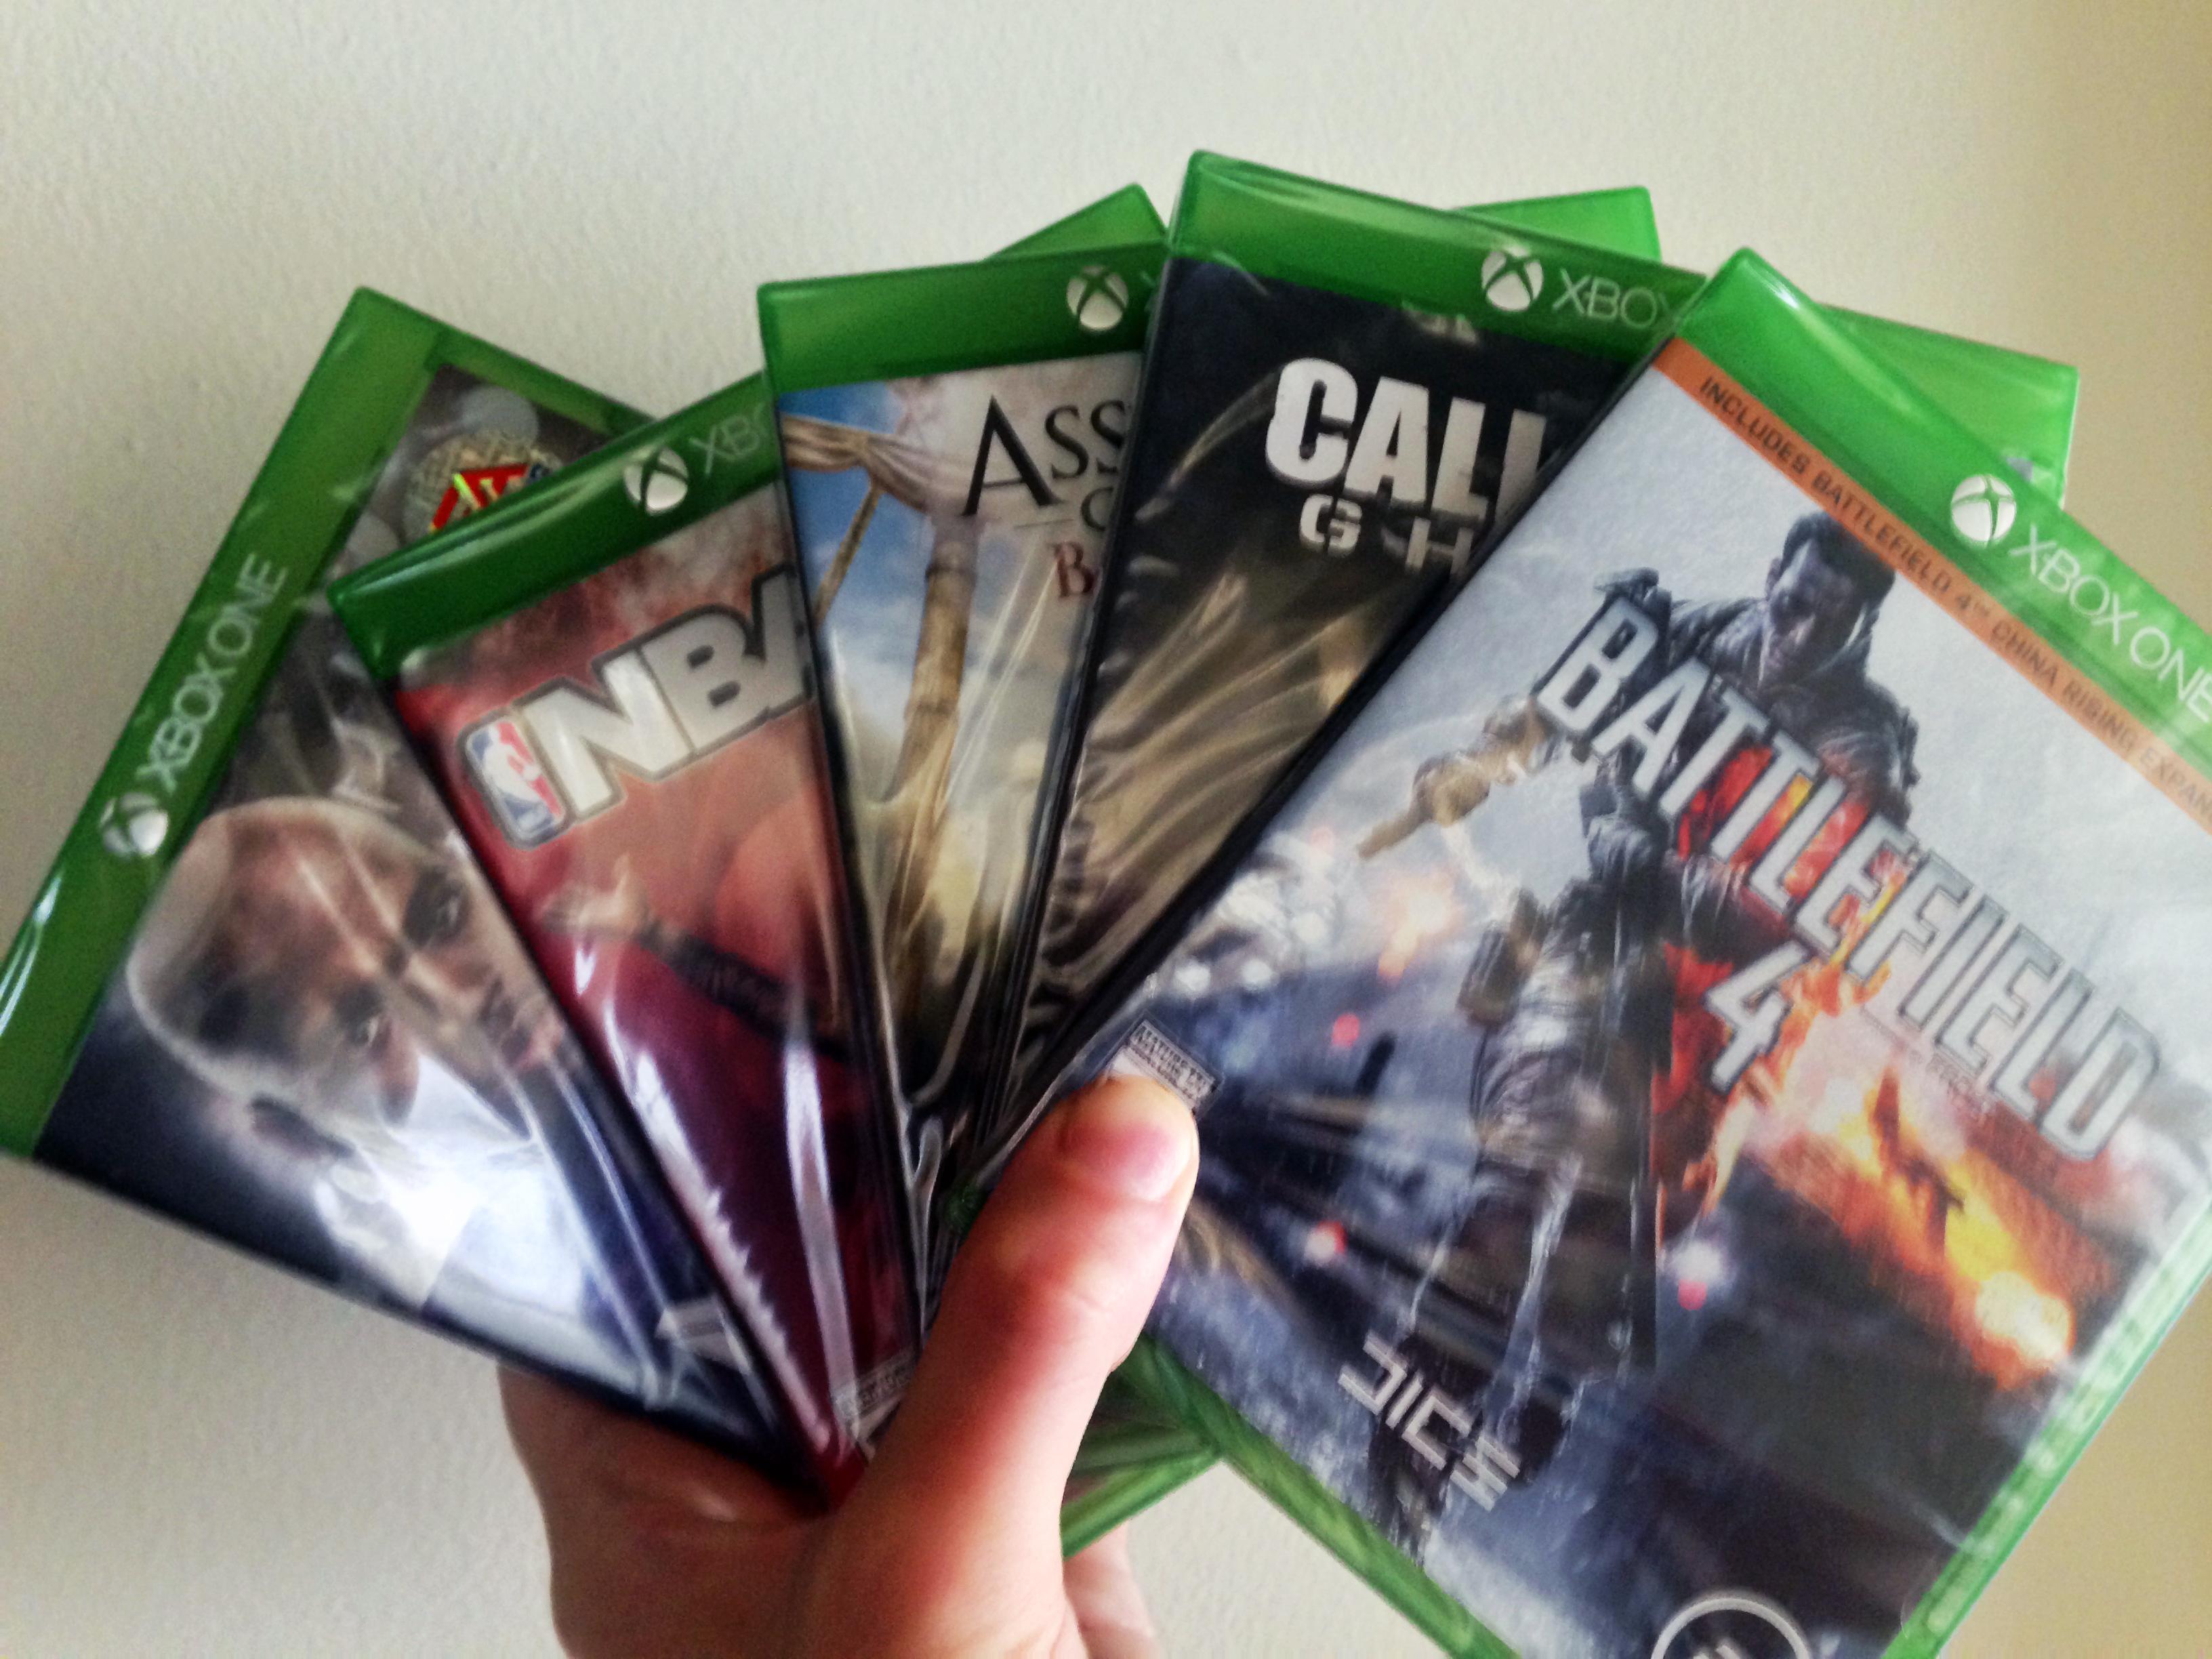 Xbox One Games S : Insane xbox one game deals slash prices below